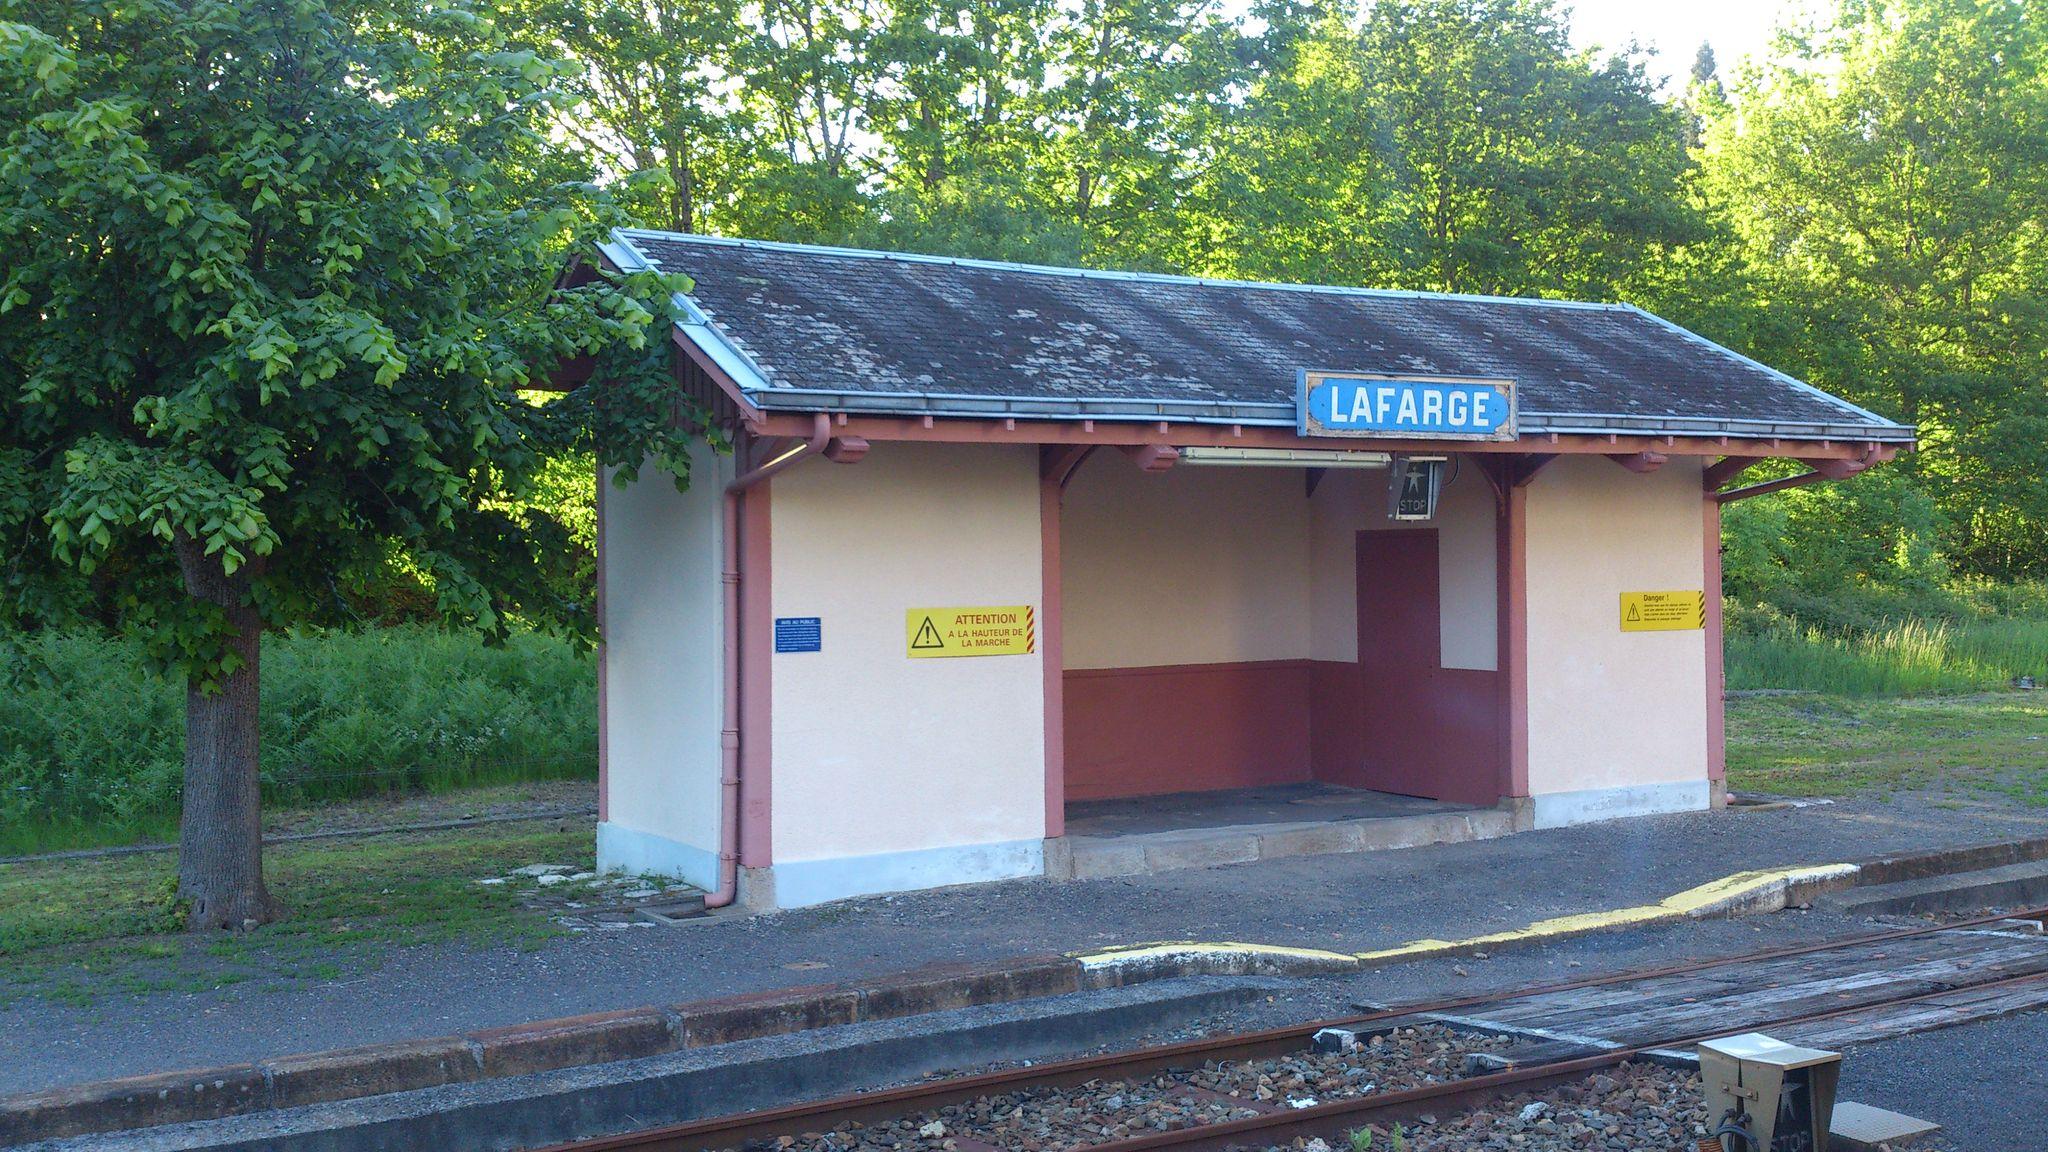 Lafarge (Haute-Vienne) 2